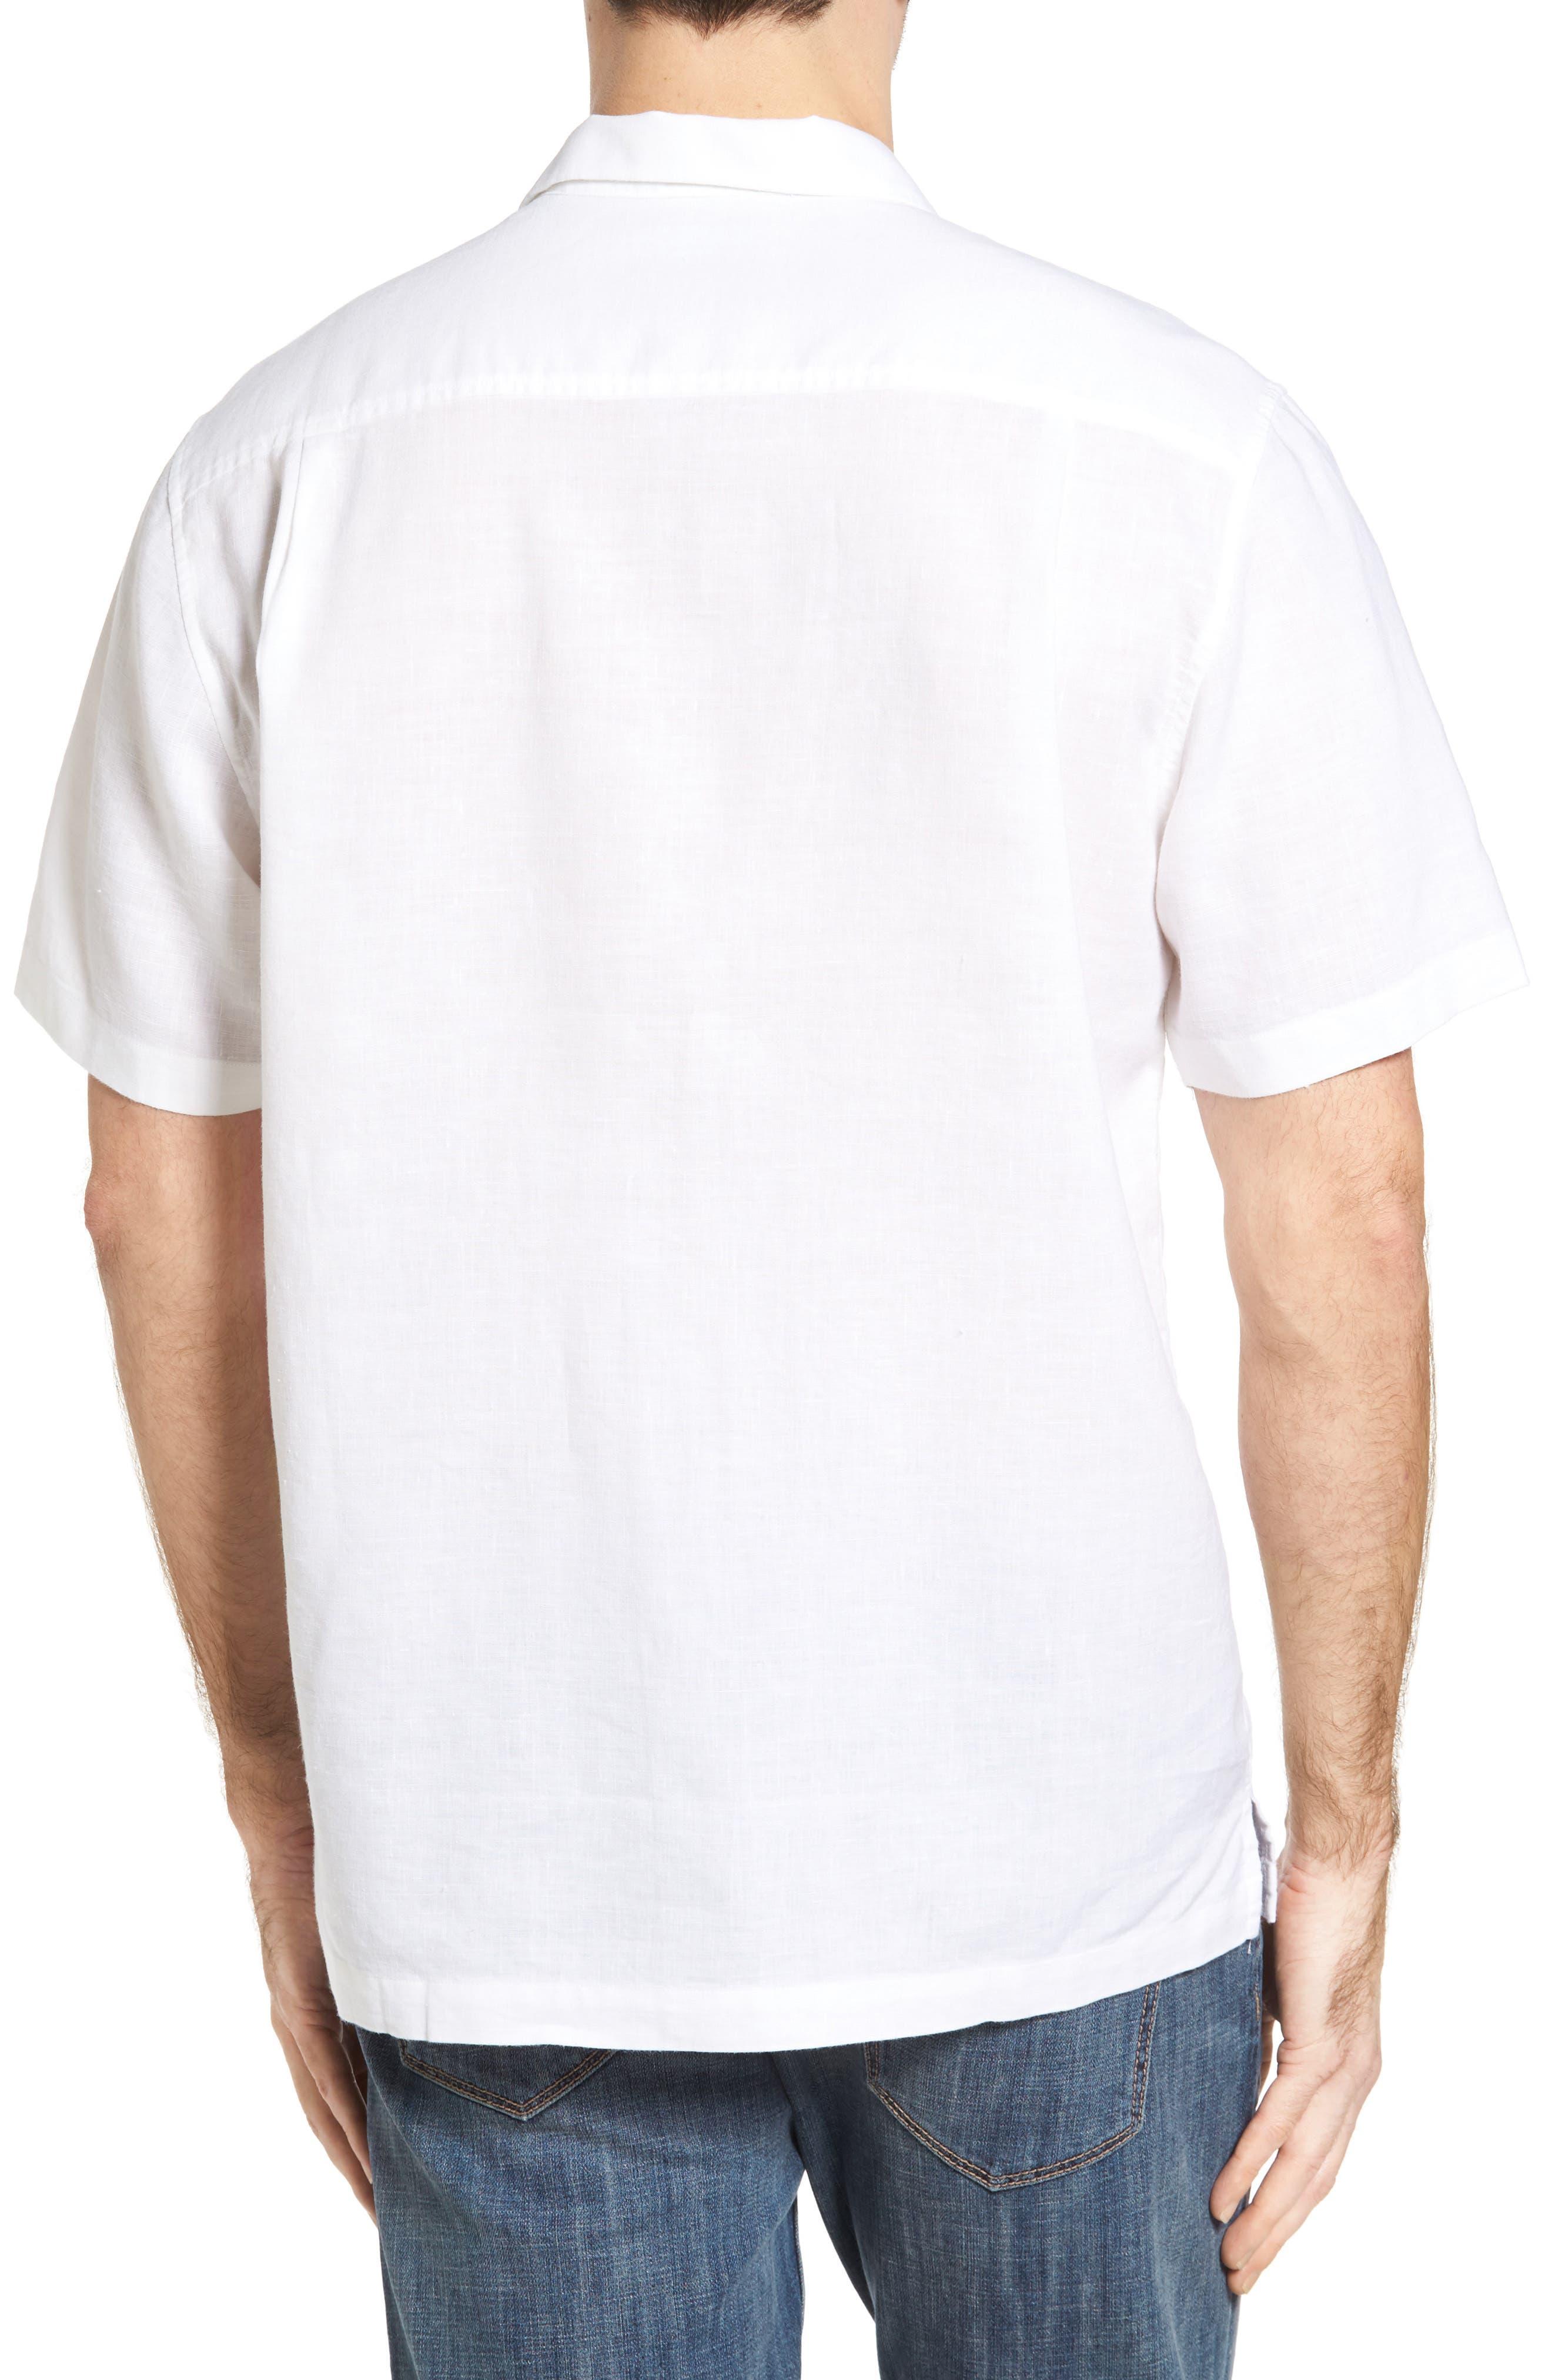 Alternate Image 2  - Tommy Bahama Monaco Tides Linen Blend Camp Shirt